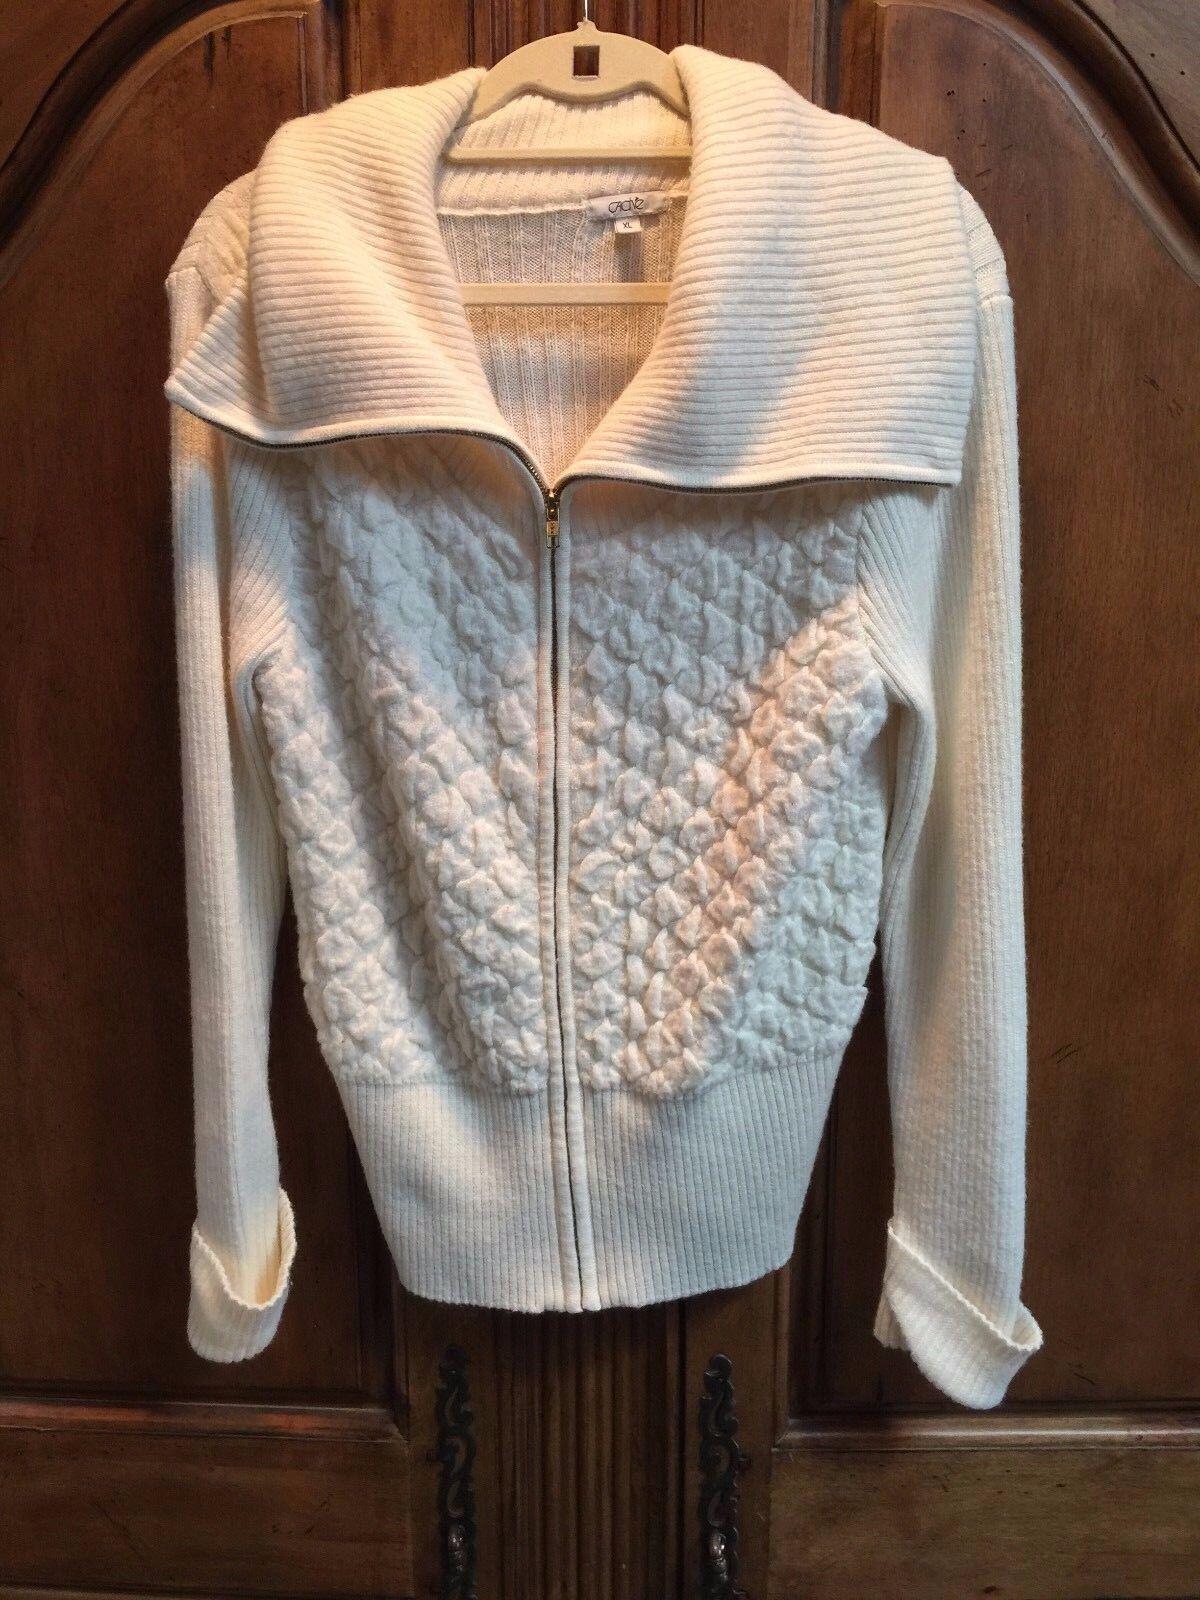 Cache Cream Zip up Knit Top Size XL New